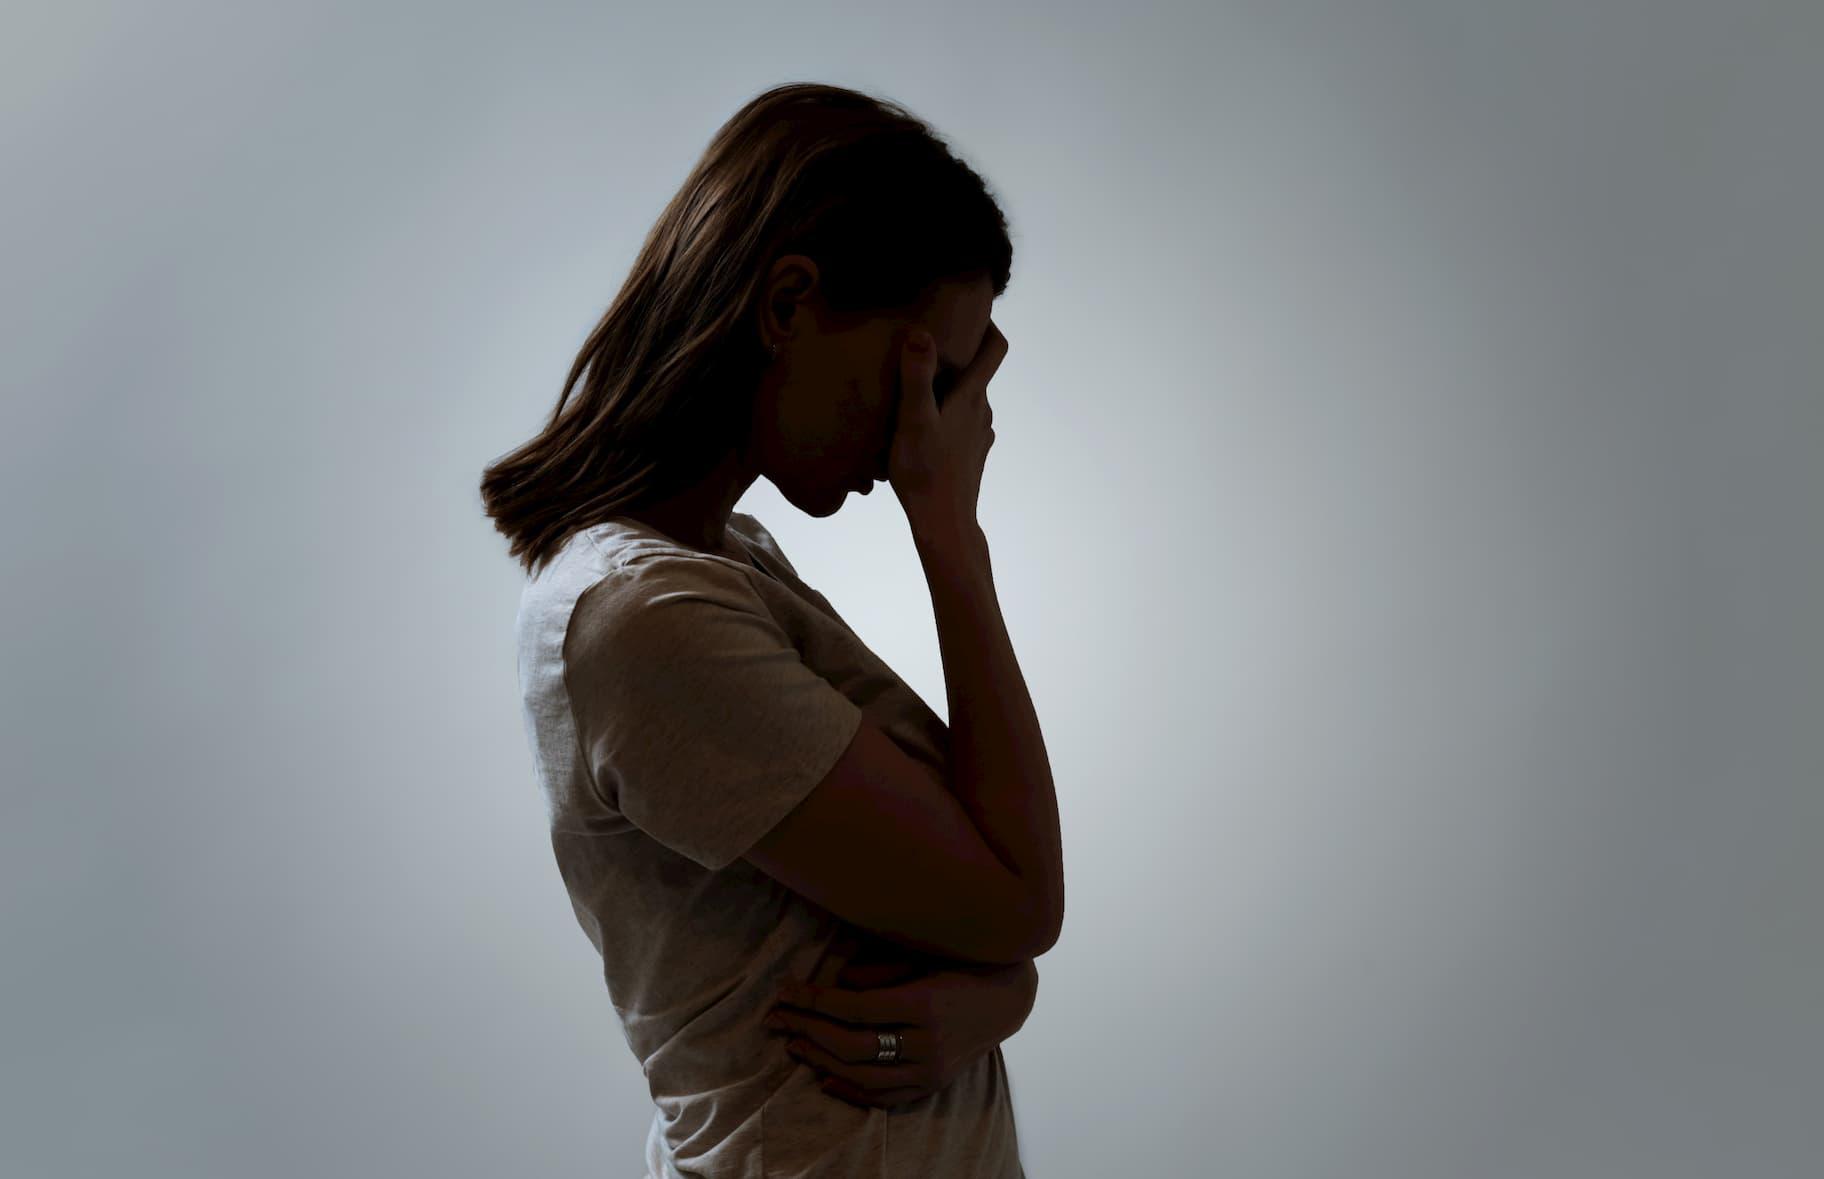 mujer depresión mano cabeza